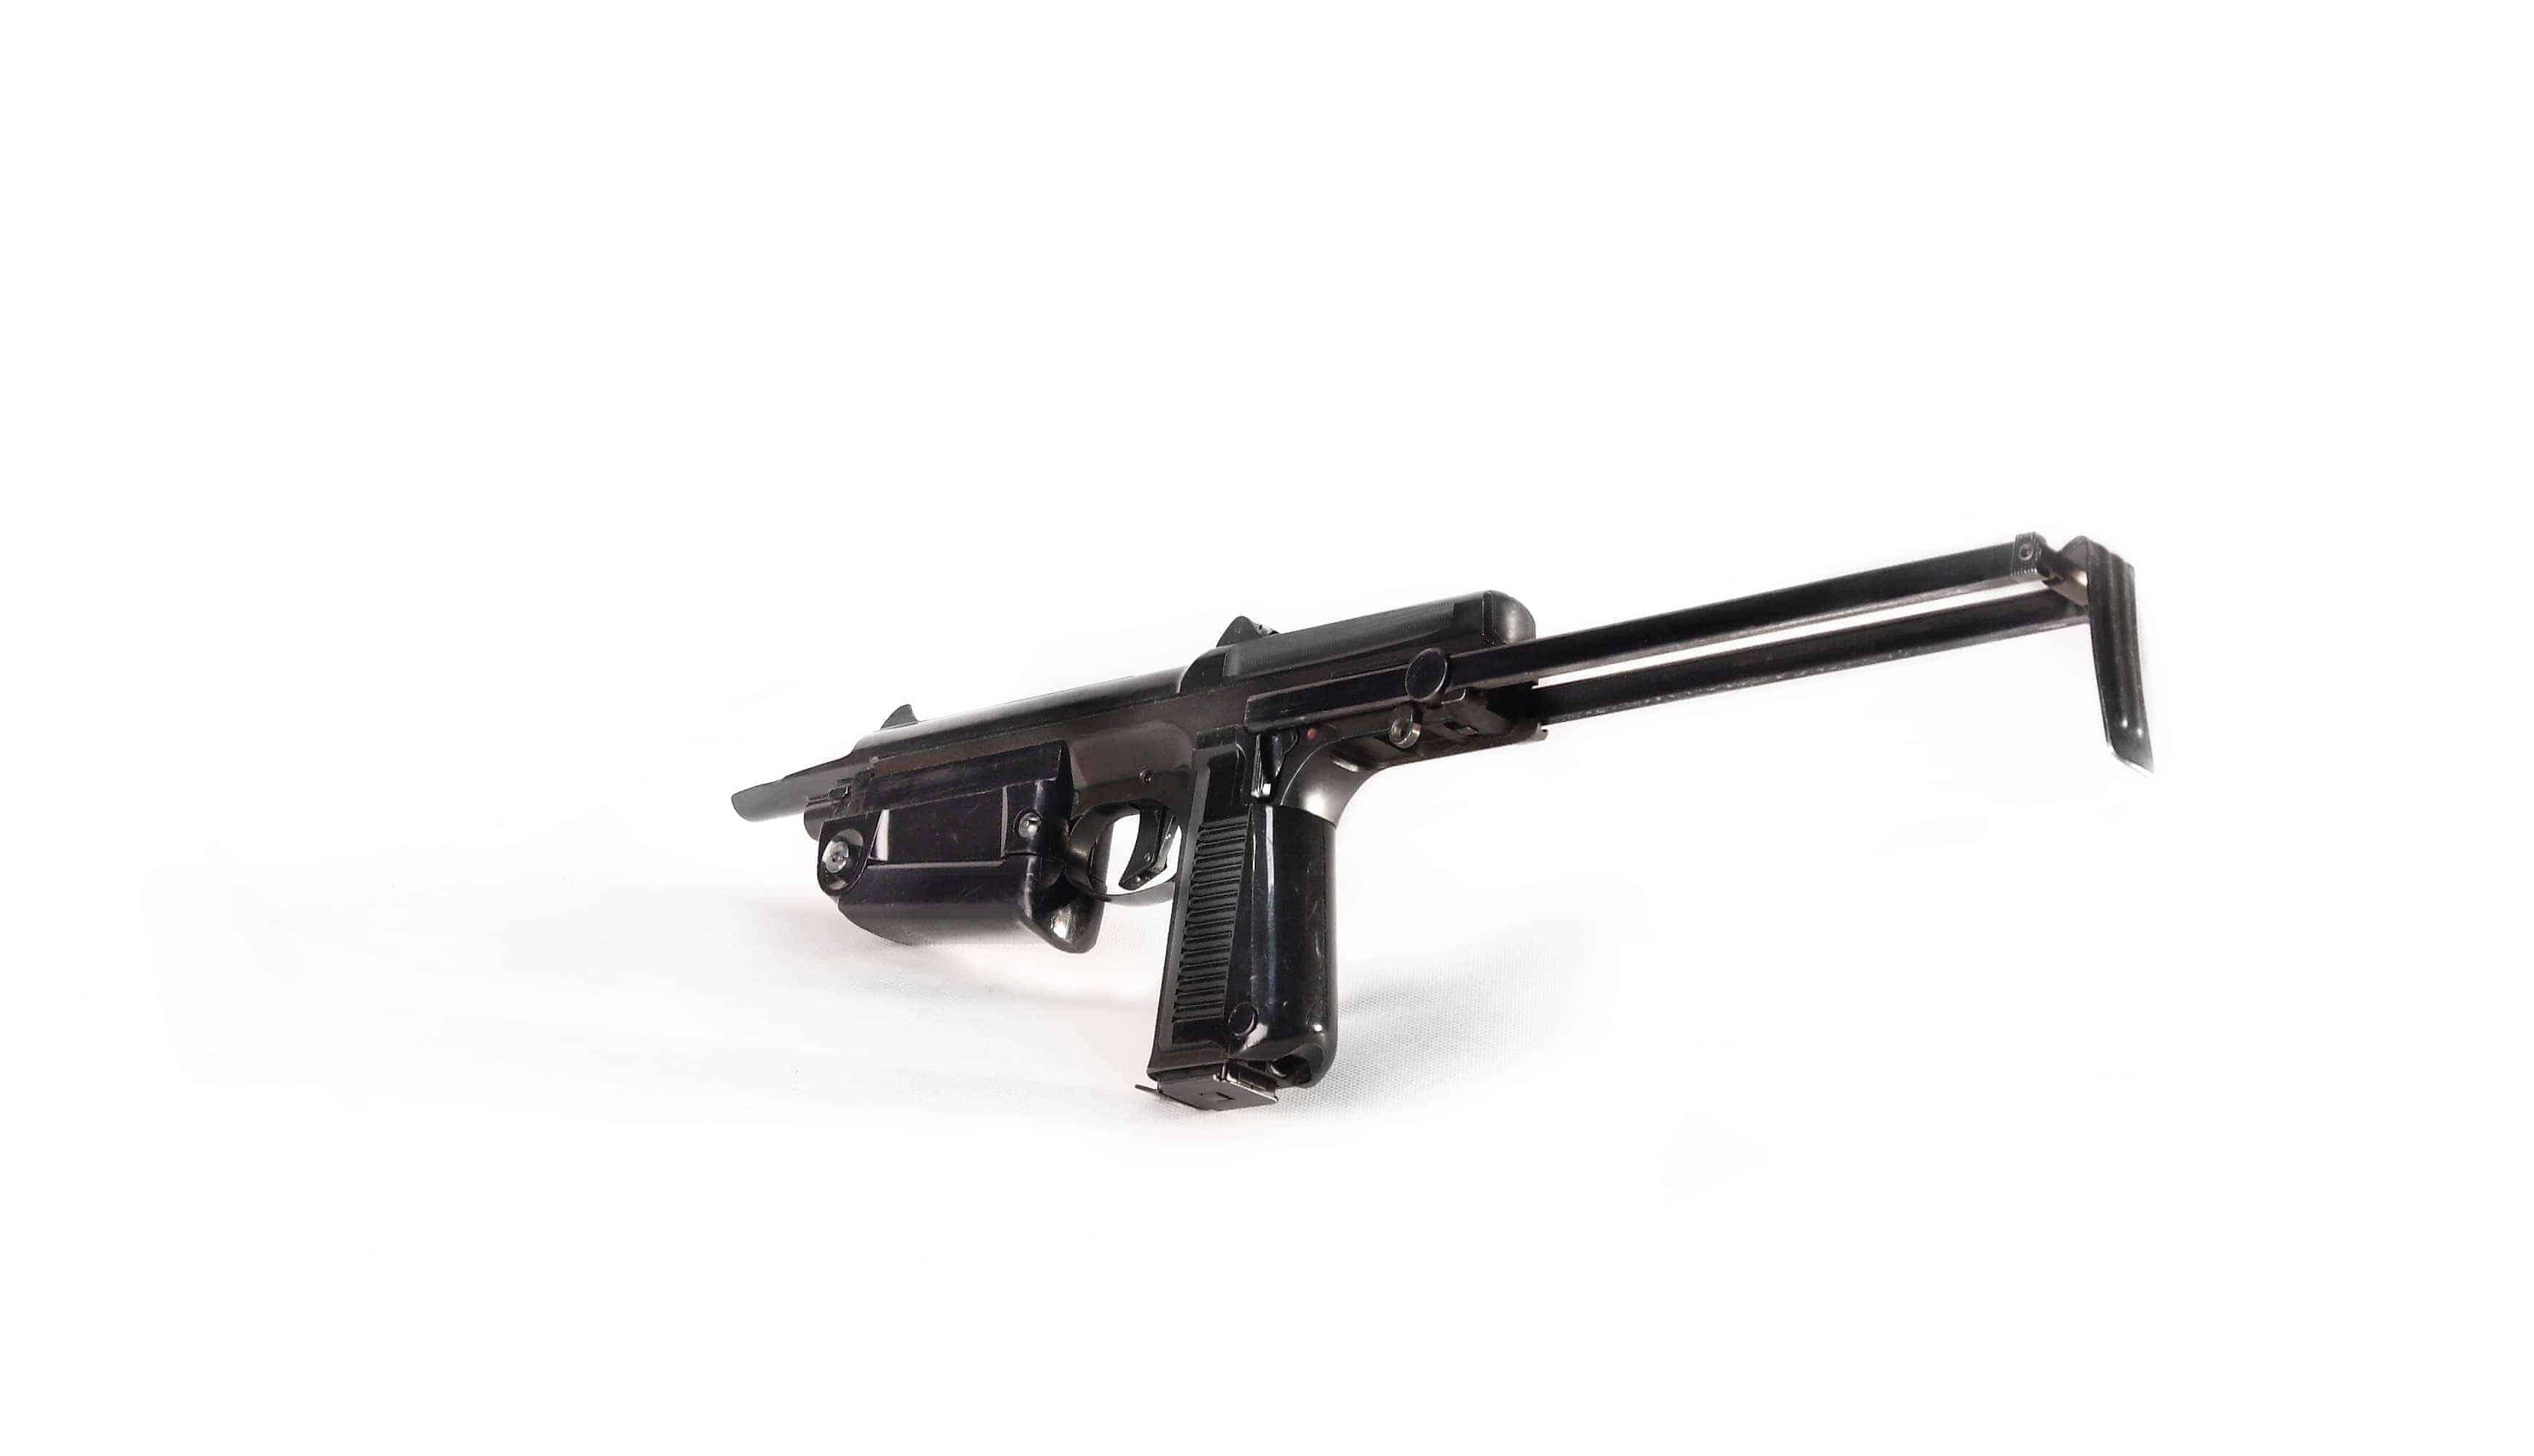 https://strzelnicabojowa.pl/uploads/guns/PM-63-RAK(9x18mm)-WEB-WIDE.JPG